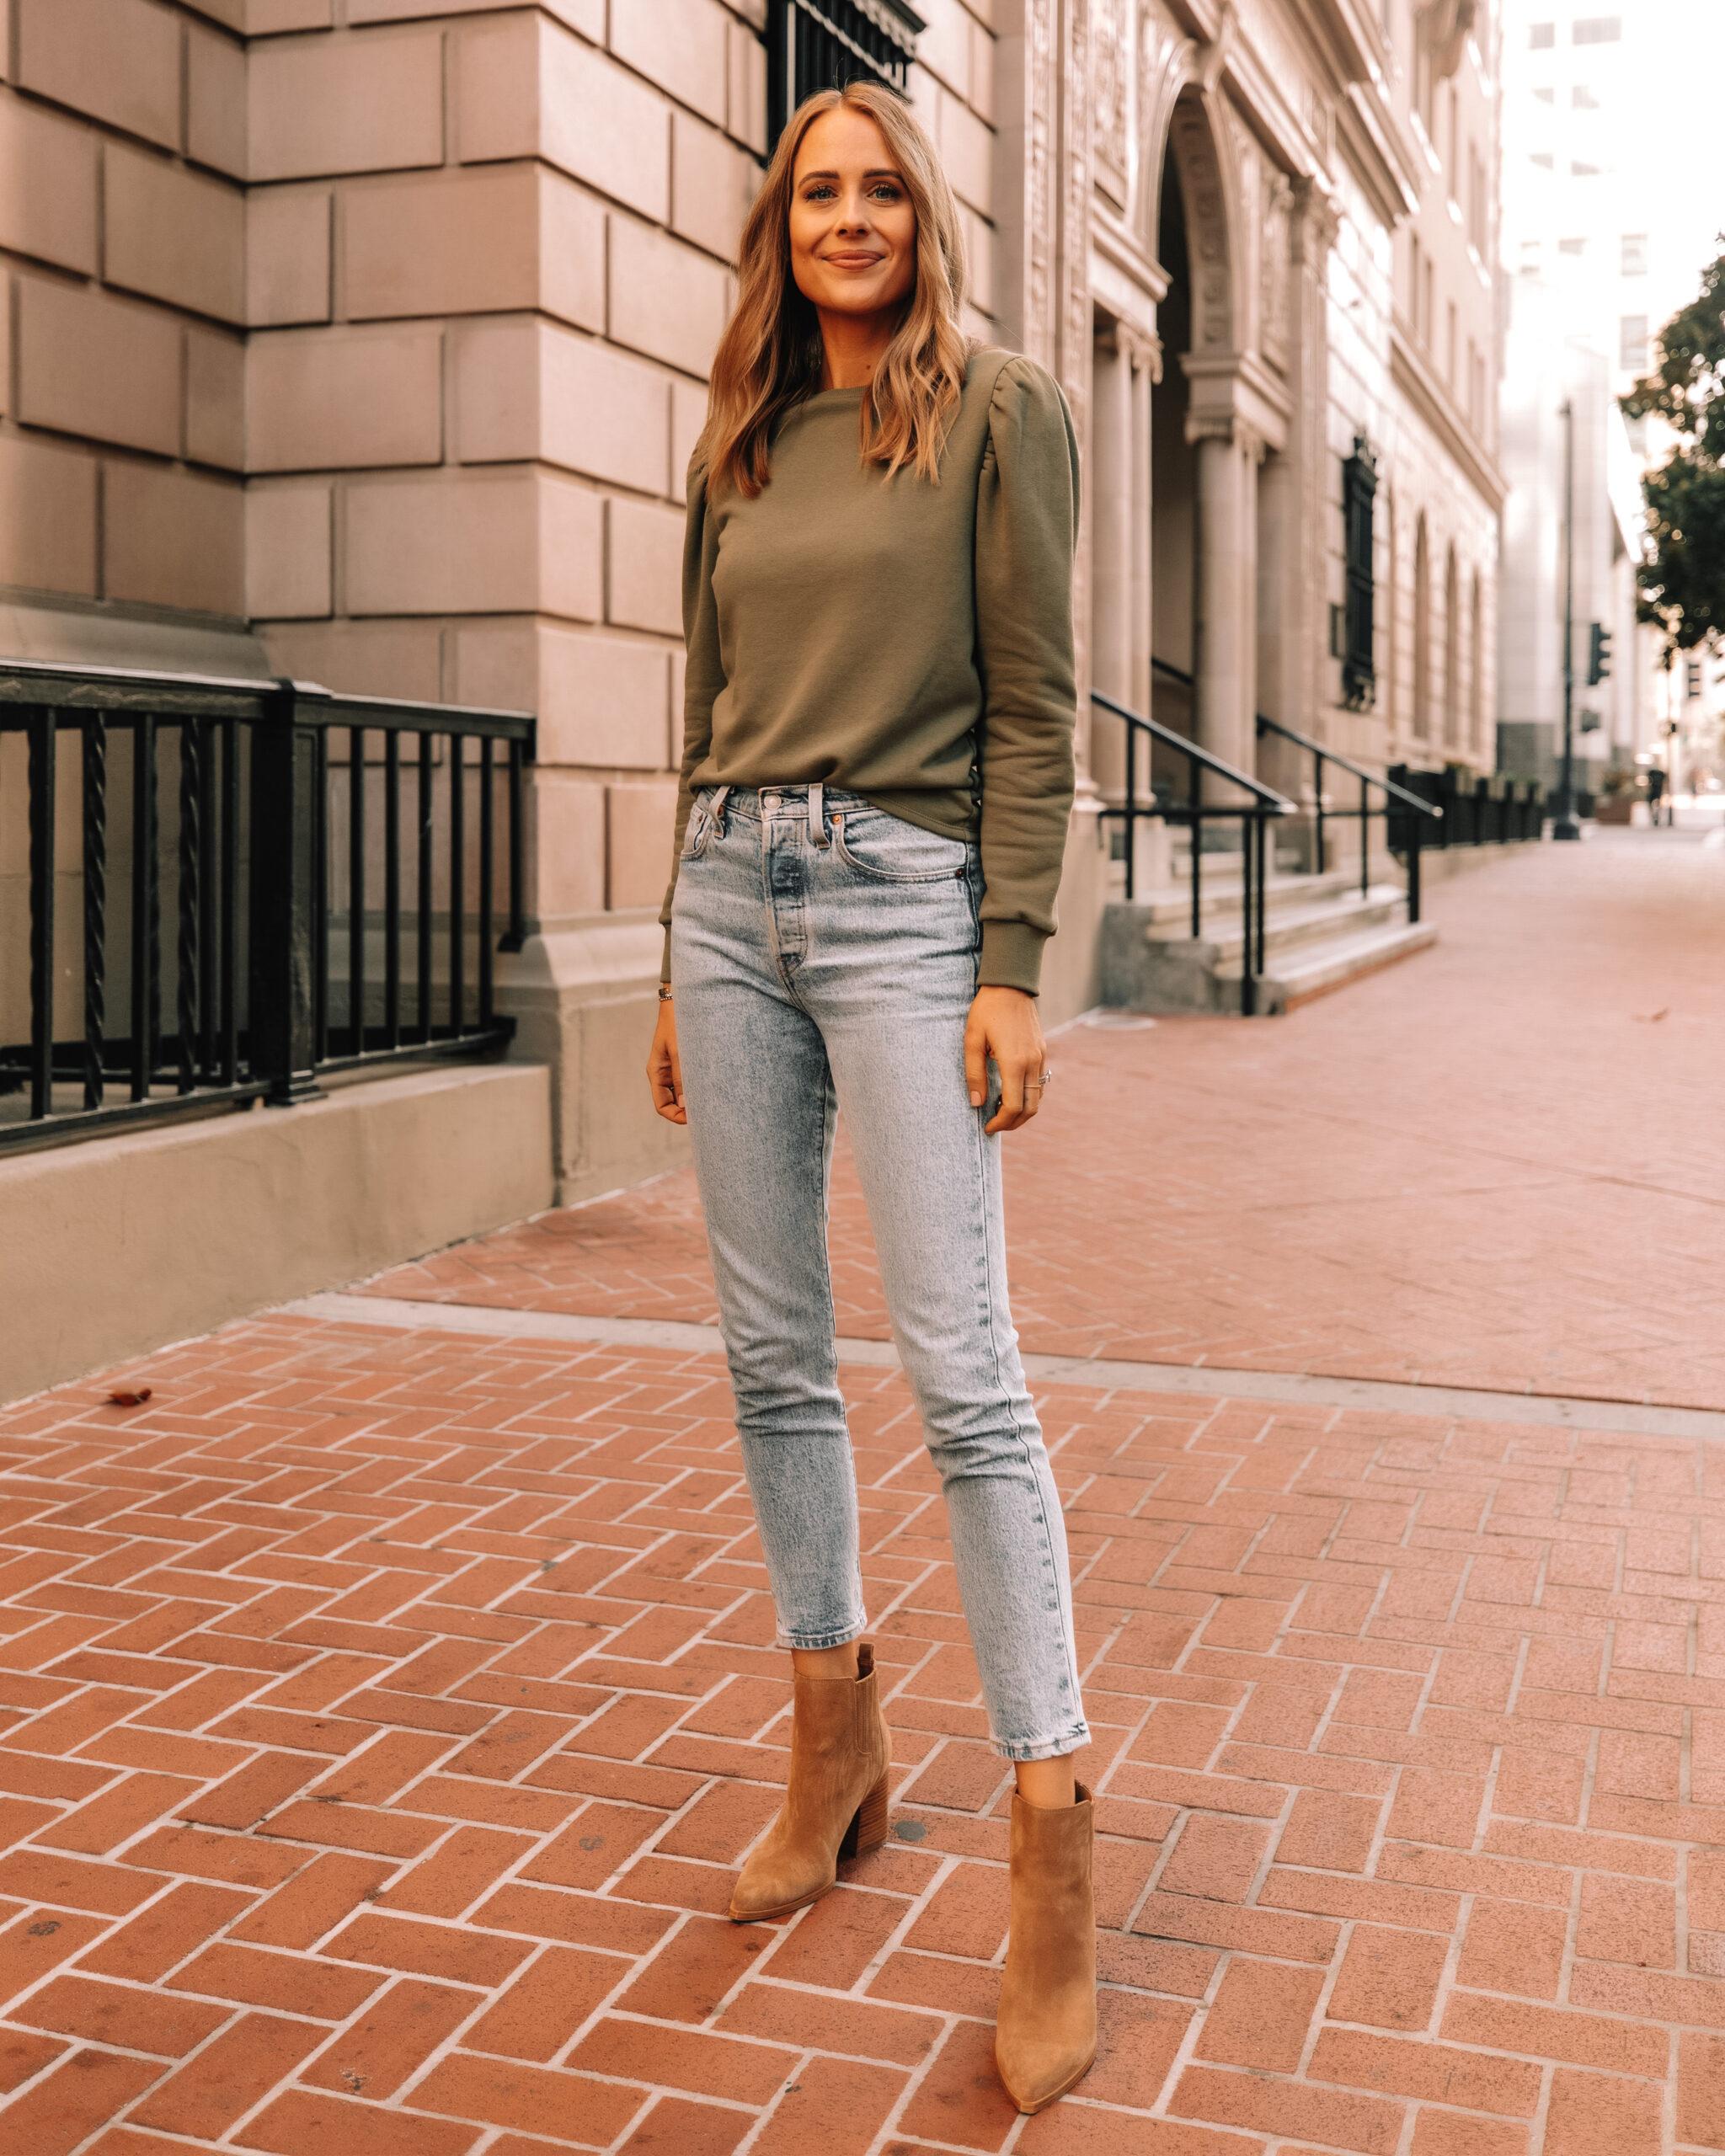 Fashion Jackson Wearing Amazon The Drop Green Puff Sleeve Sweatshirt Denim Skinny Jeans Tan Suede Booties